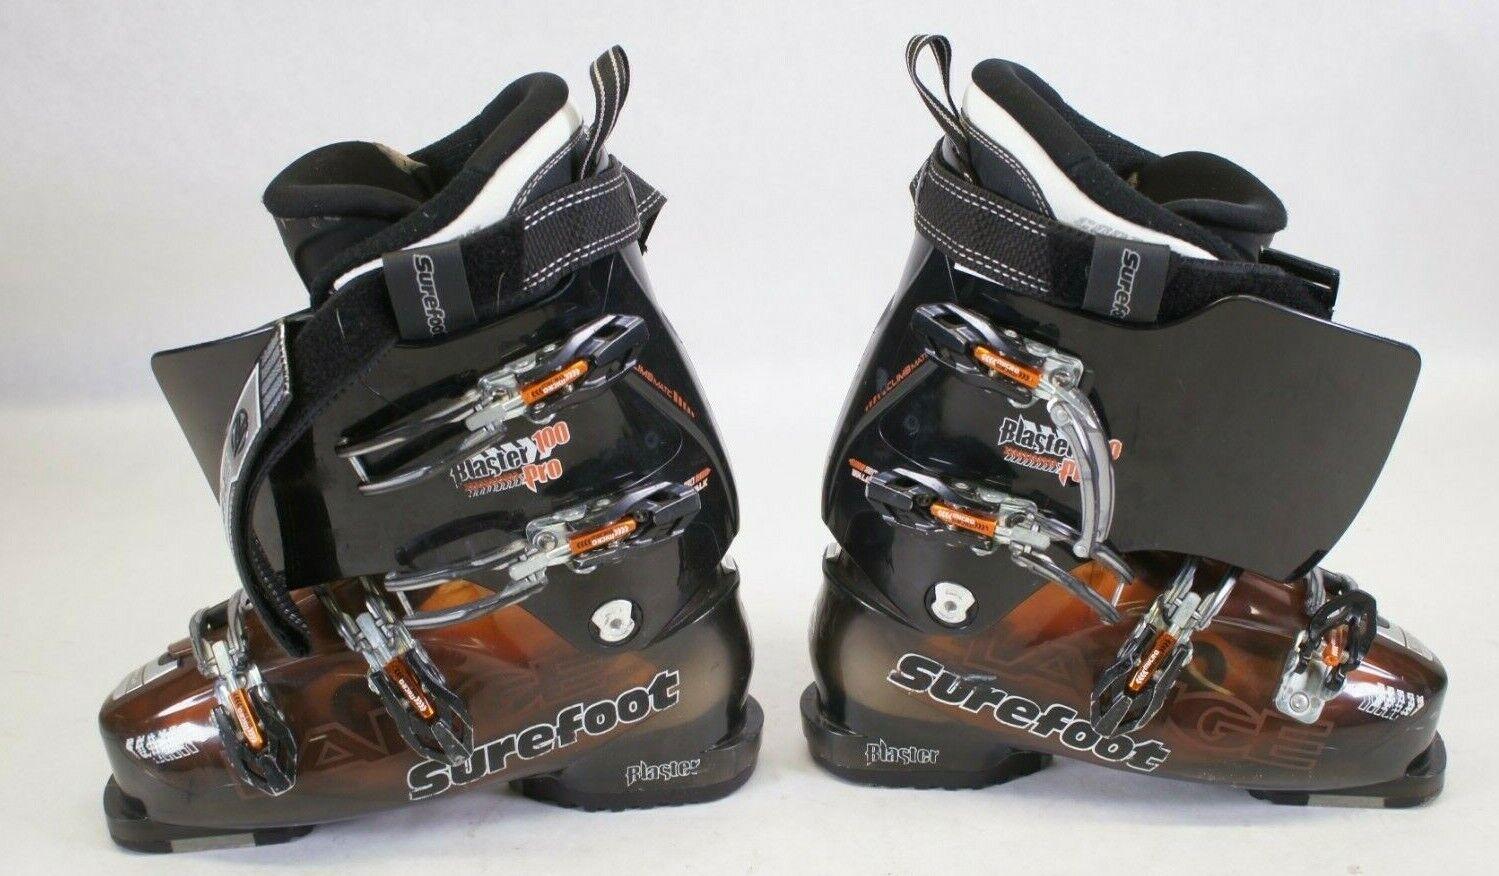 Lange Blaster 100 Pro Surefoot Contoure Ski Stiefel Größe  26.5 310mm